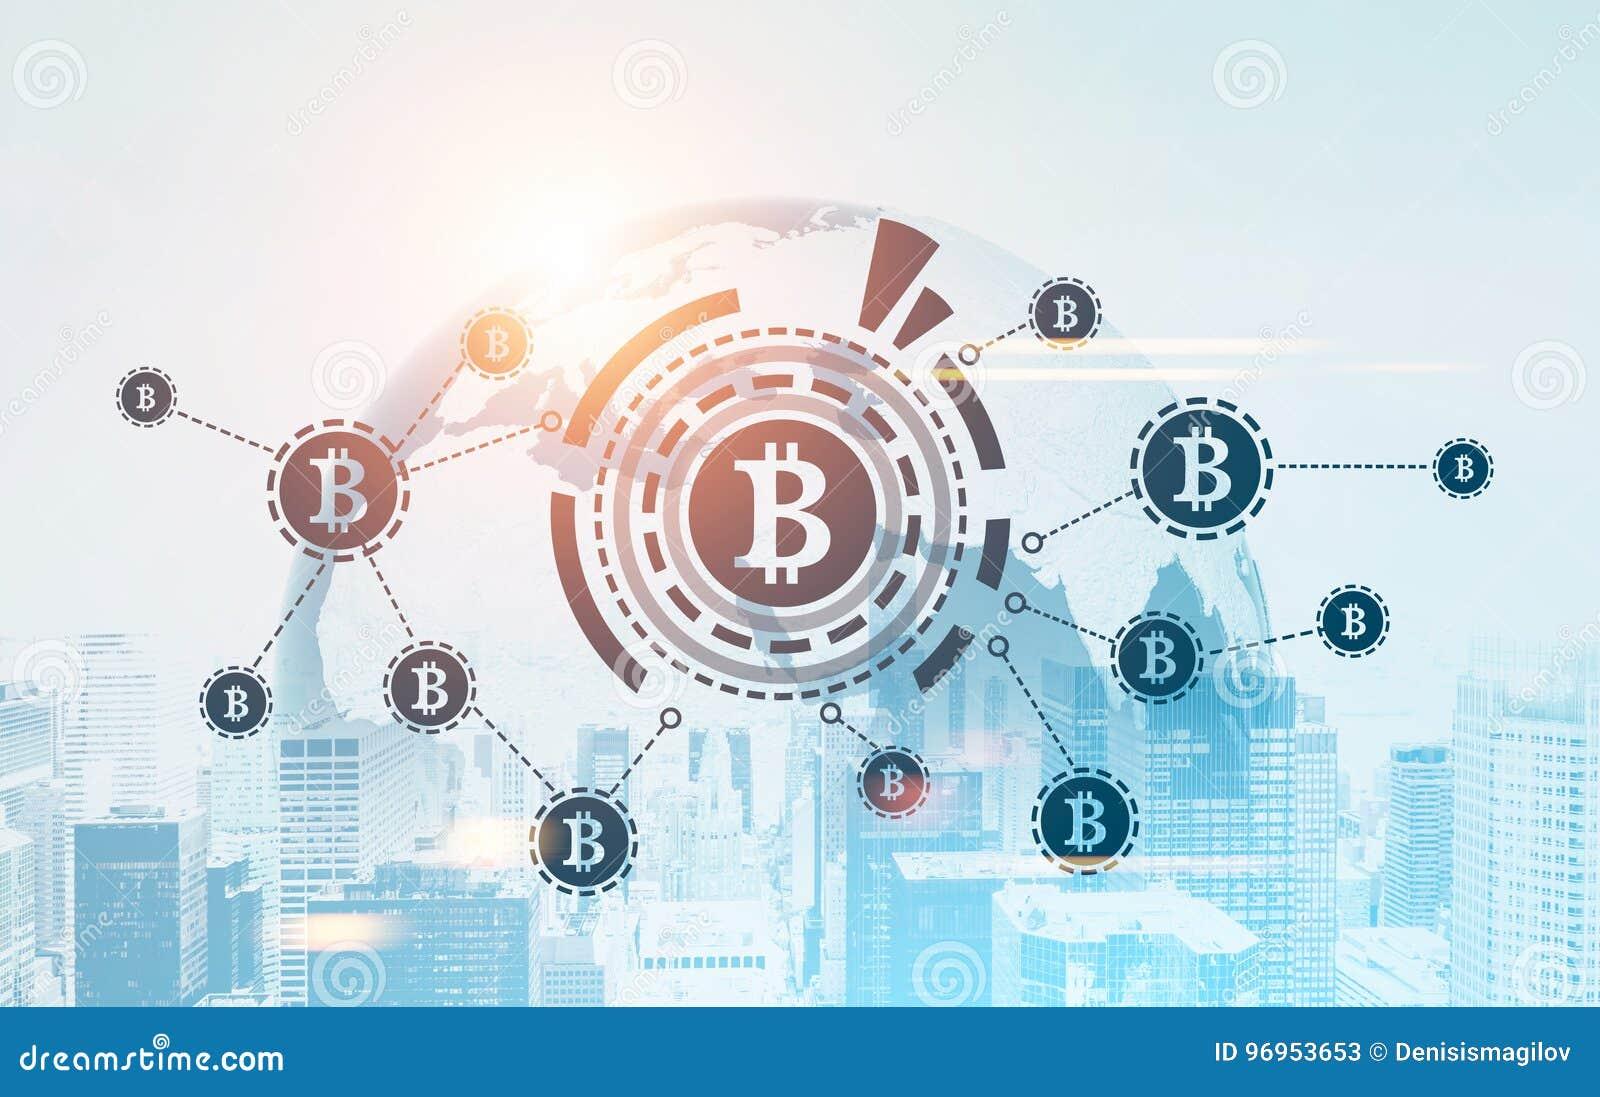 Internet Of Bitcoin Network Diagram - ~ Wiring Diagram Portal ~ •